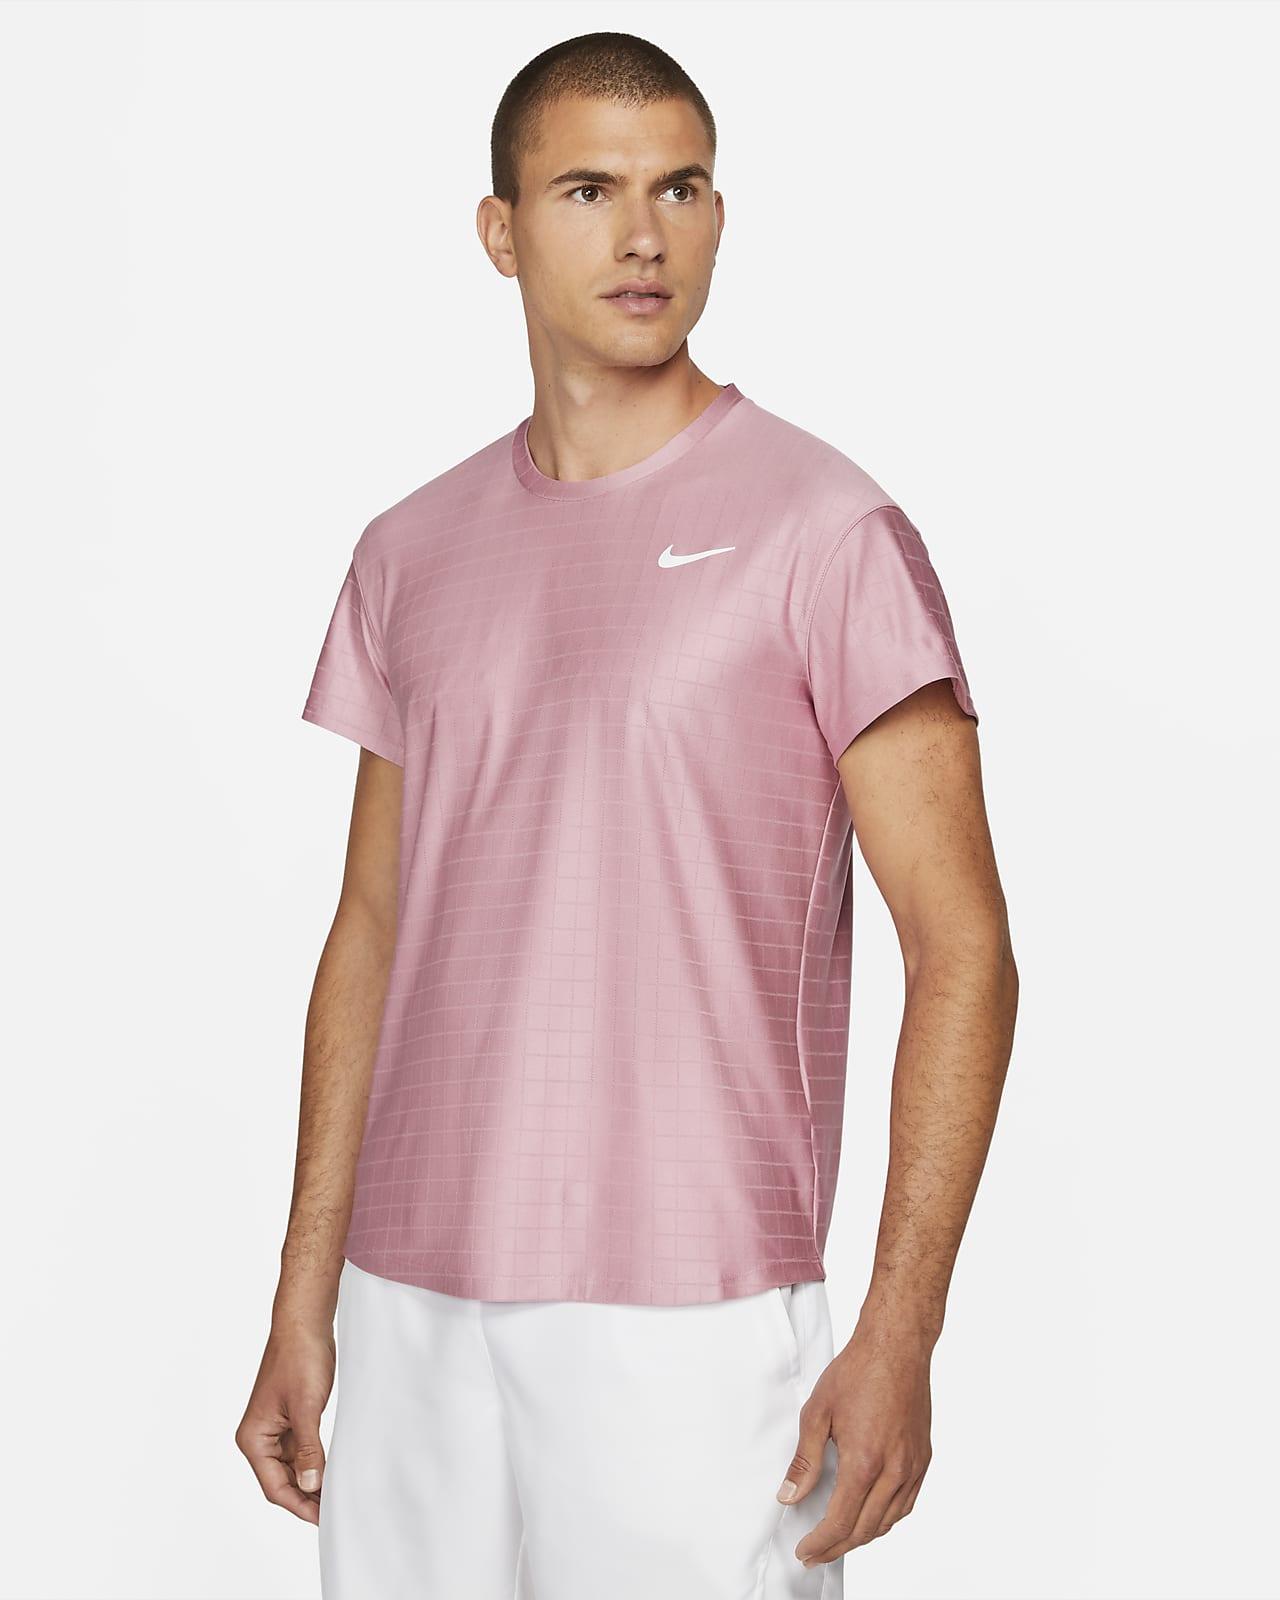 Prenda para la parte superior de tenis para hombre NikeCourt Dri-FIT Advantage